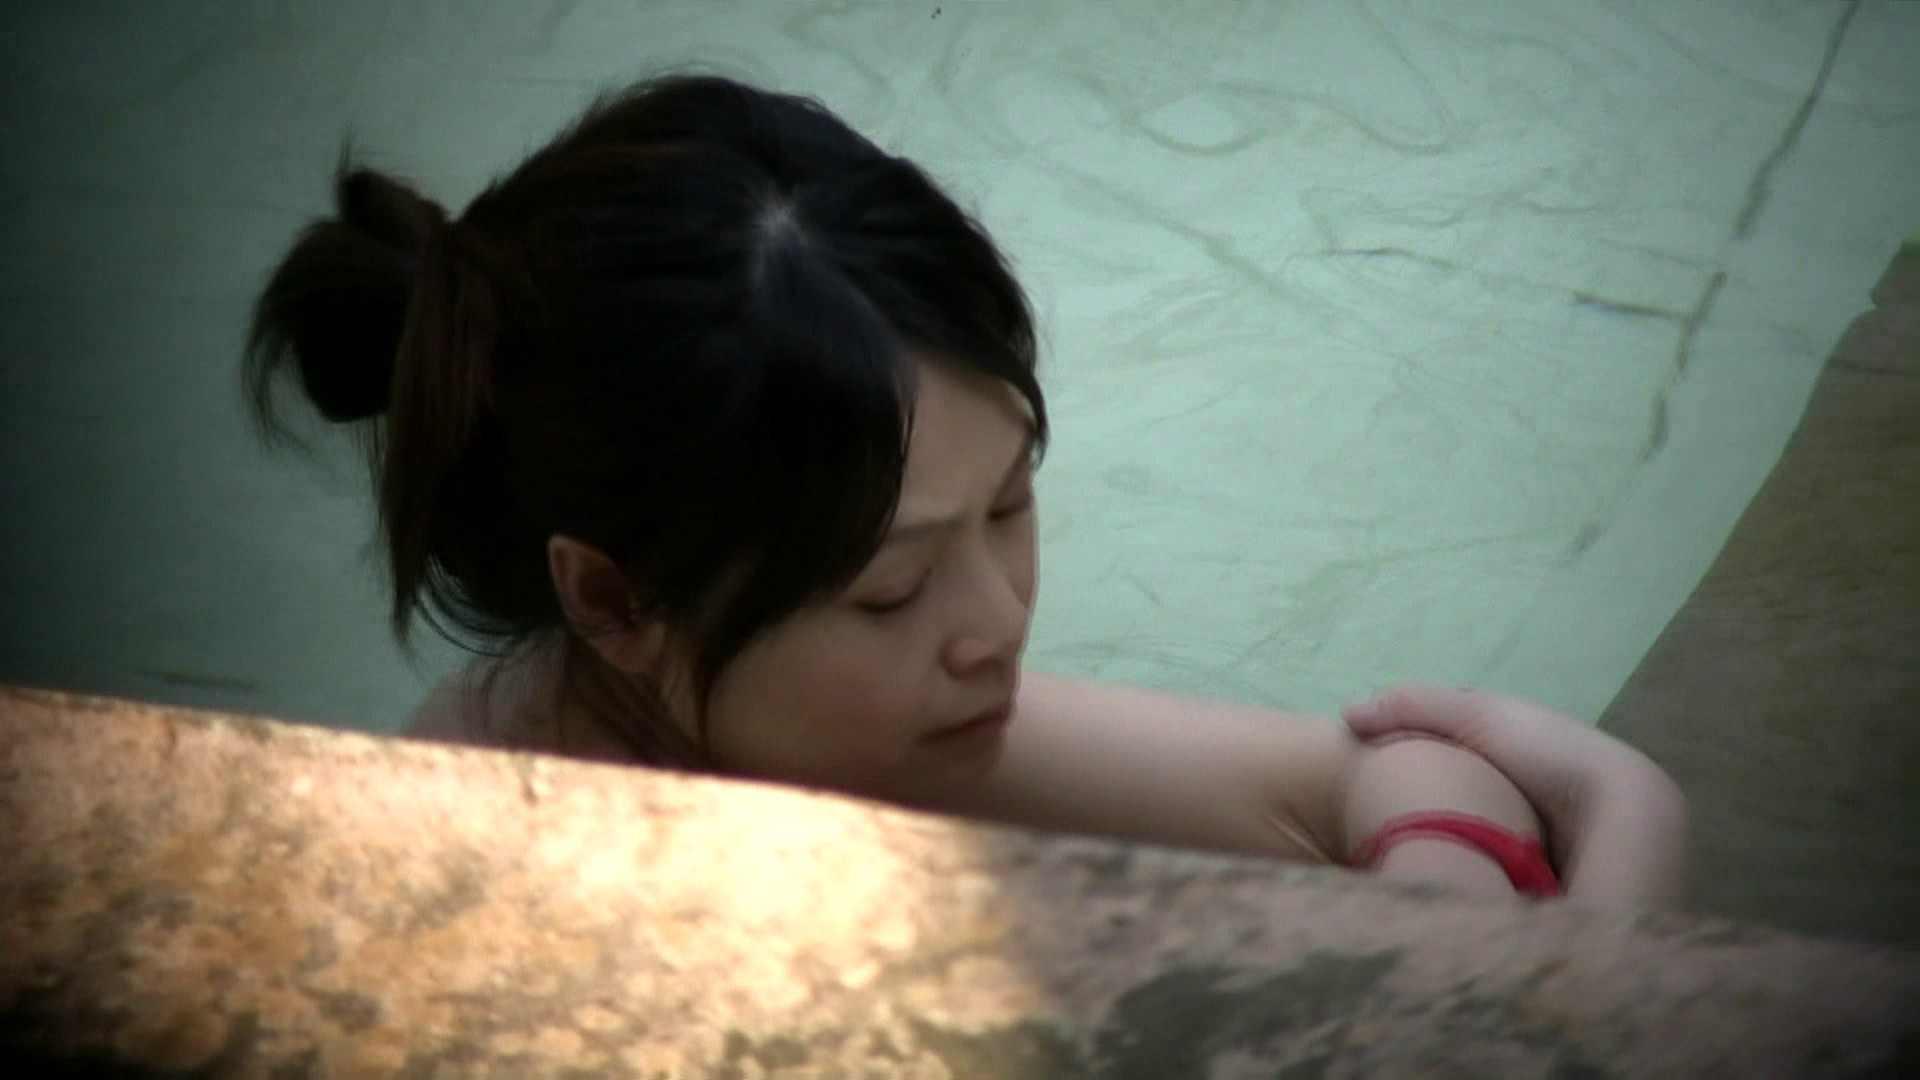 Aquaな露天風呂Vol.652 盗撮 | HなOL  105pic 23